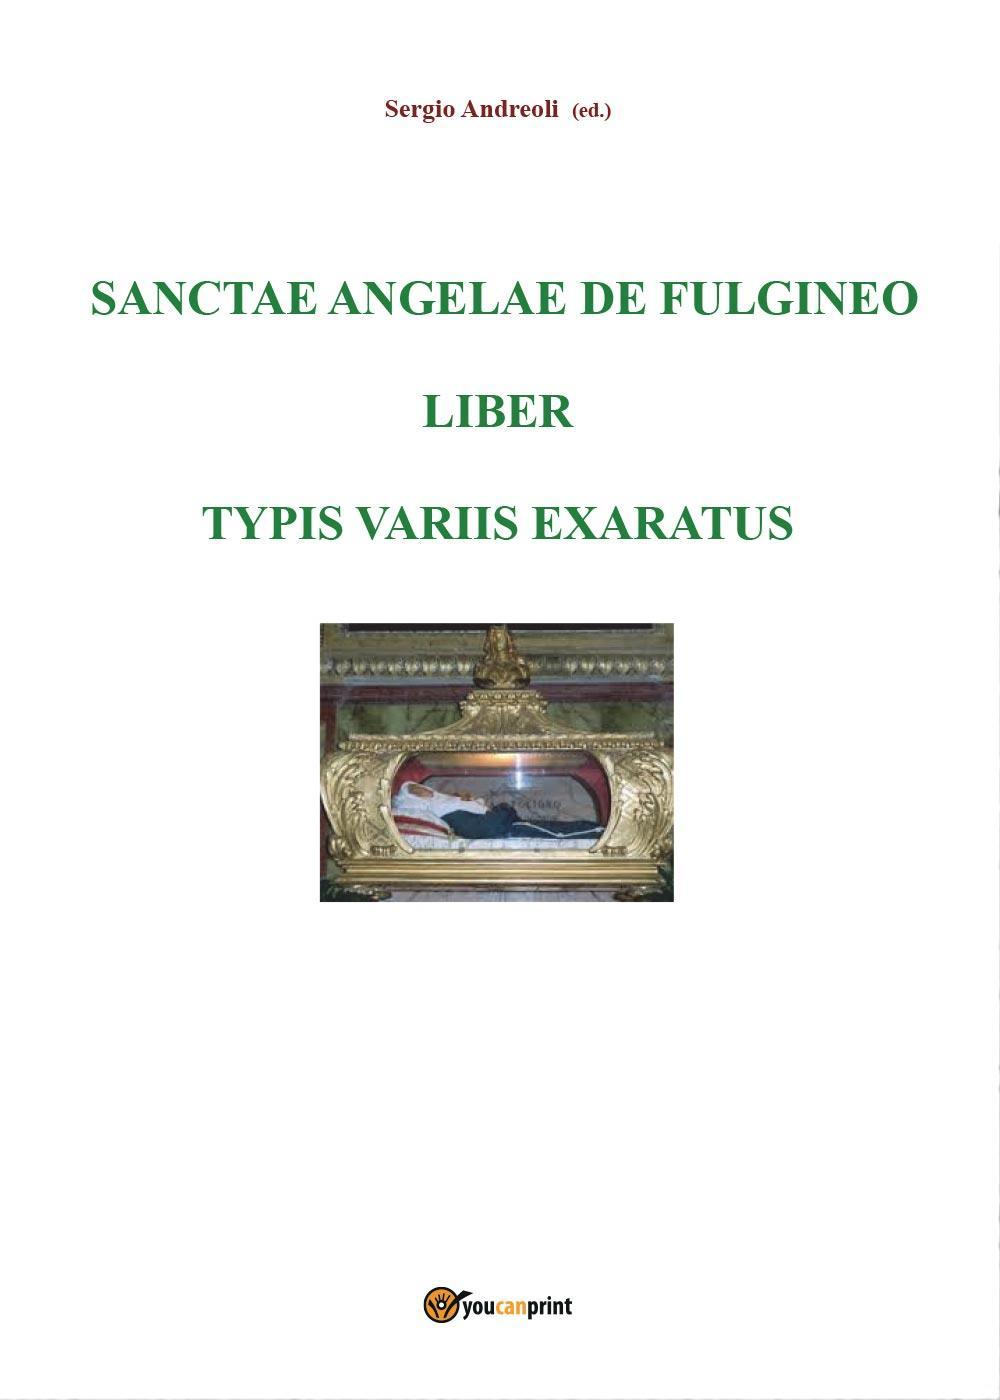 Sanctae Angelae de Fulgineo liber typis variis exaratus